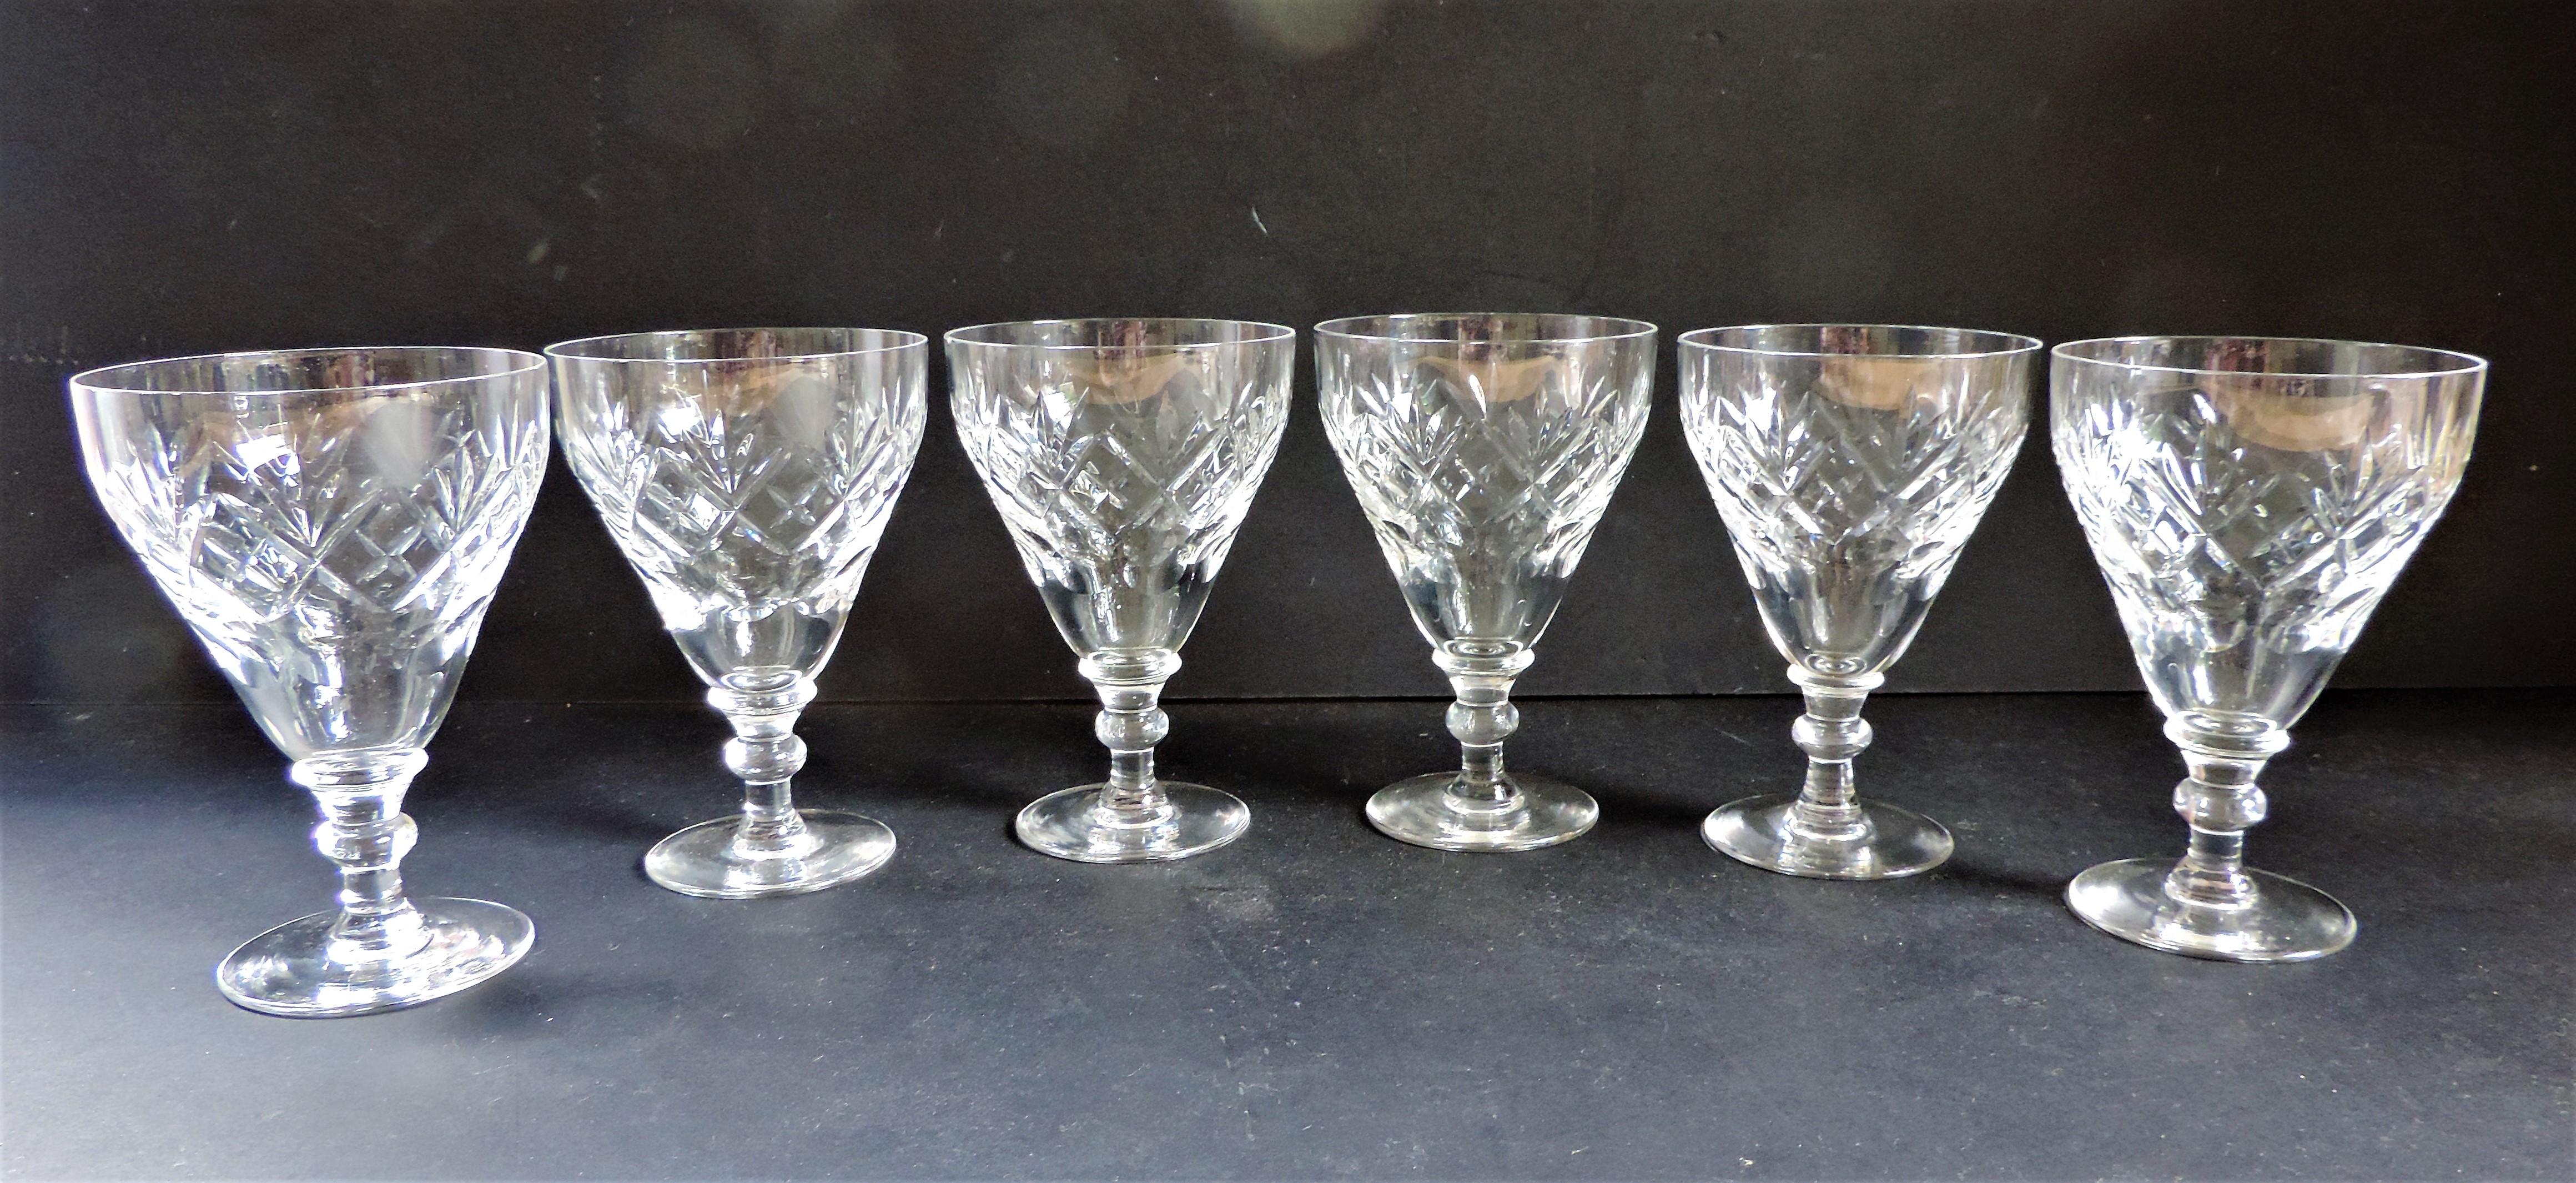 Vintage Crystal Wine Glasses Matching Set of 6 - Image 2 of 3